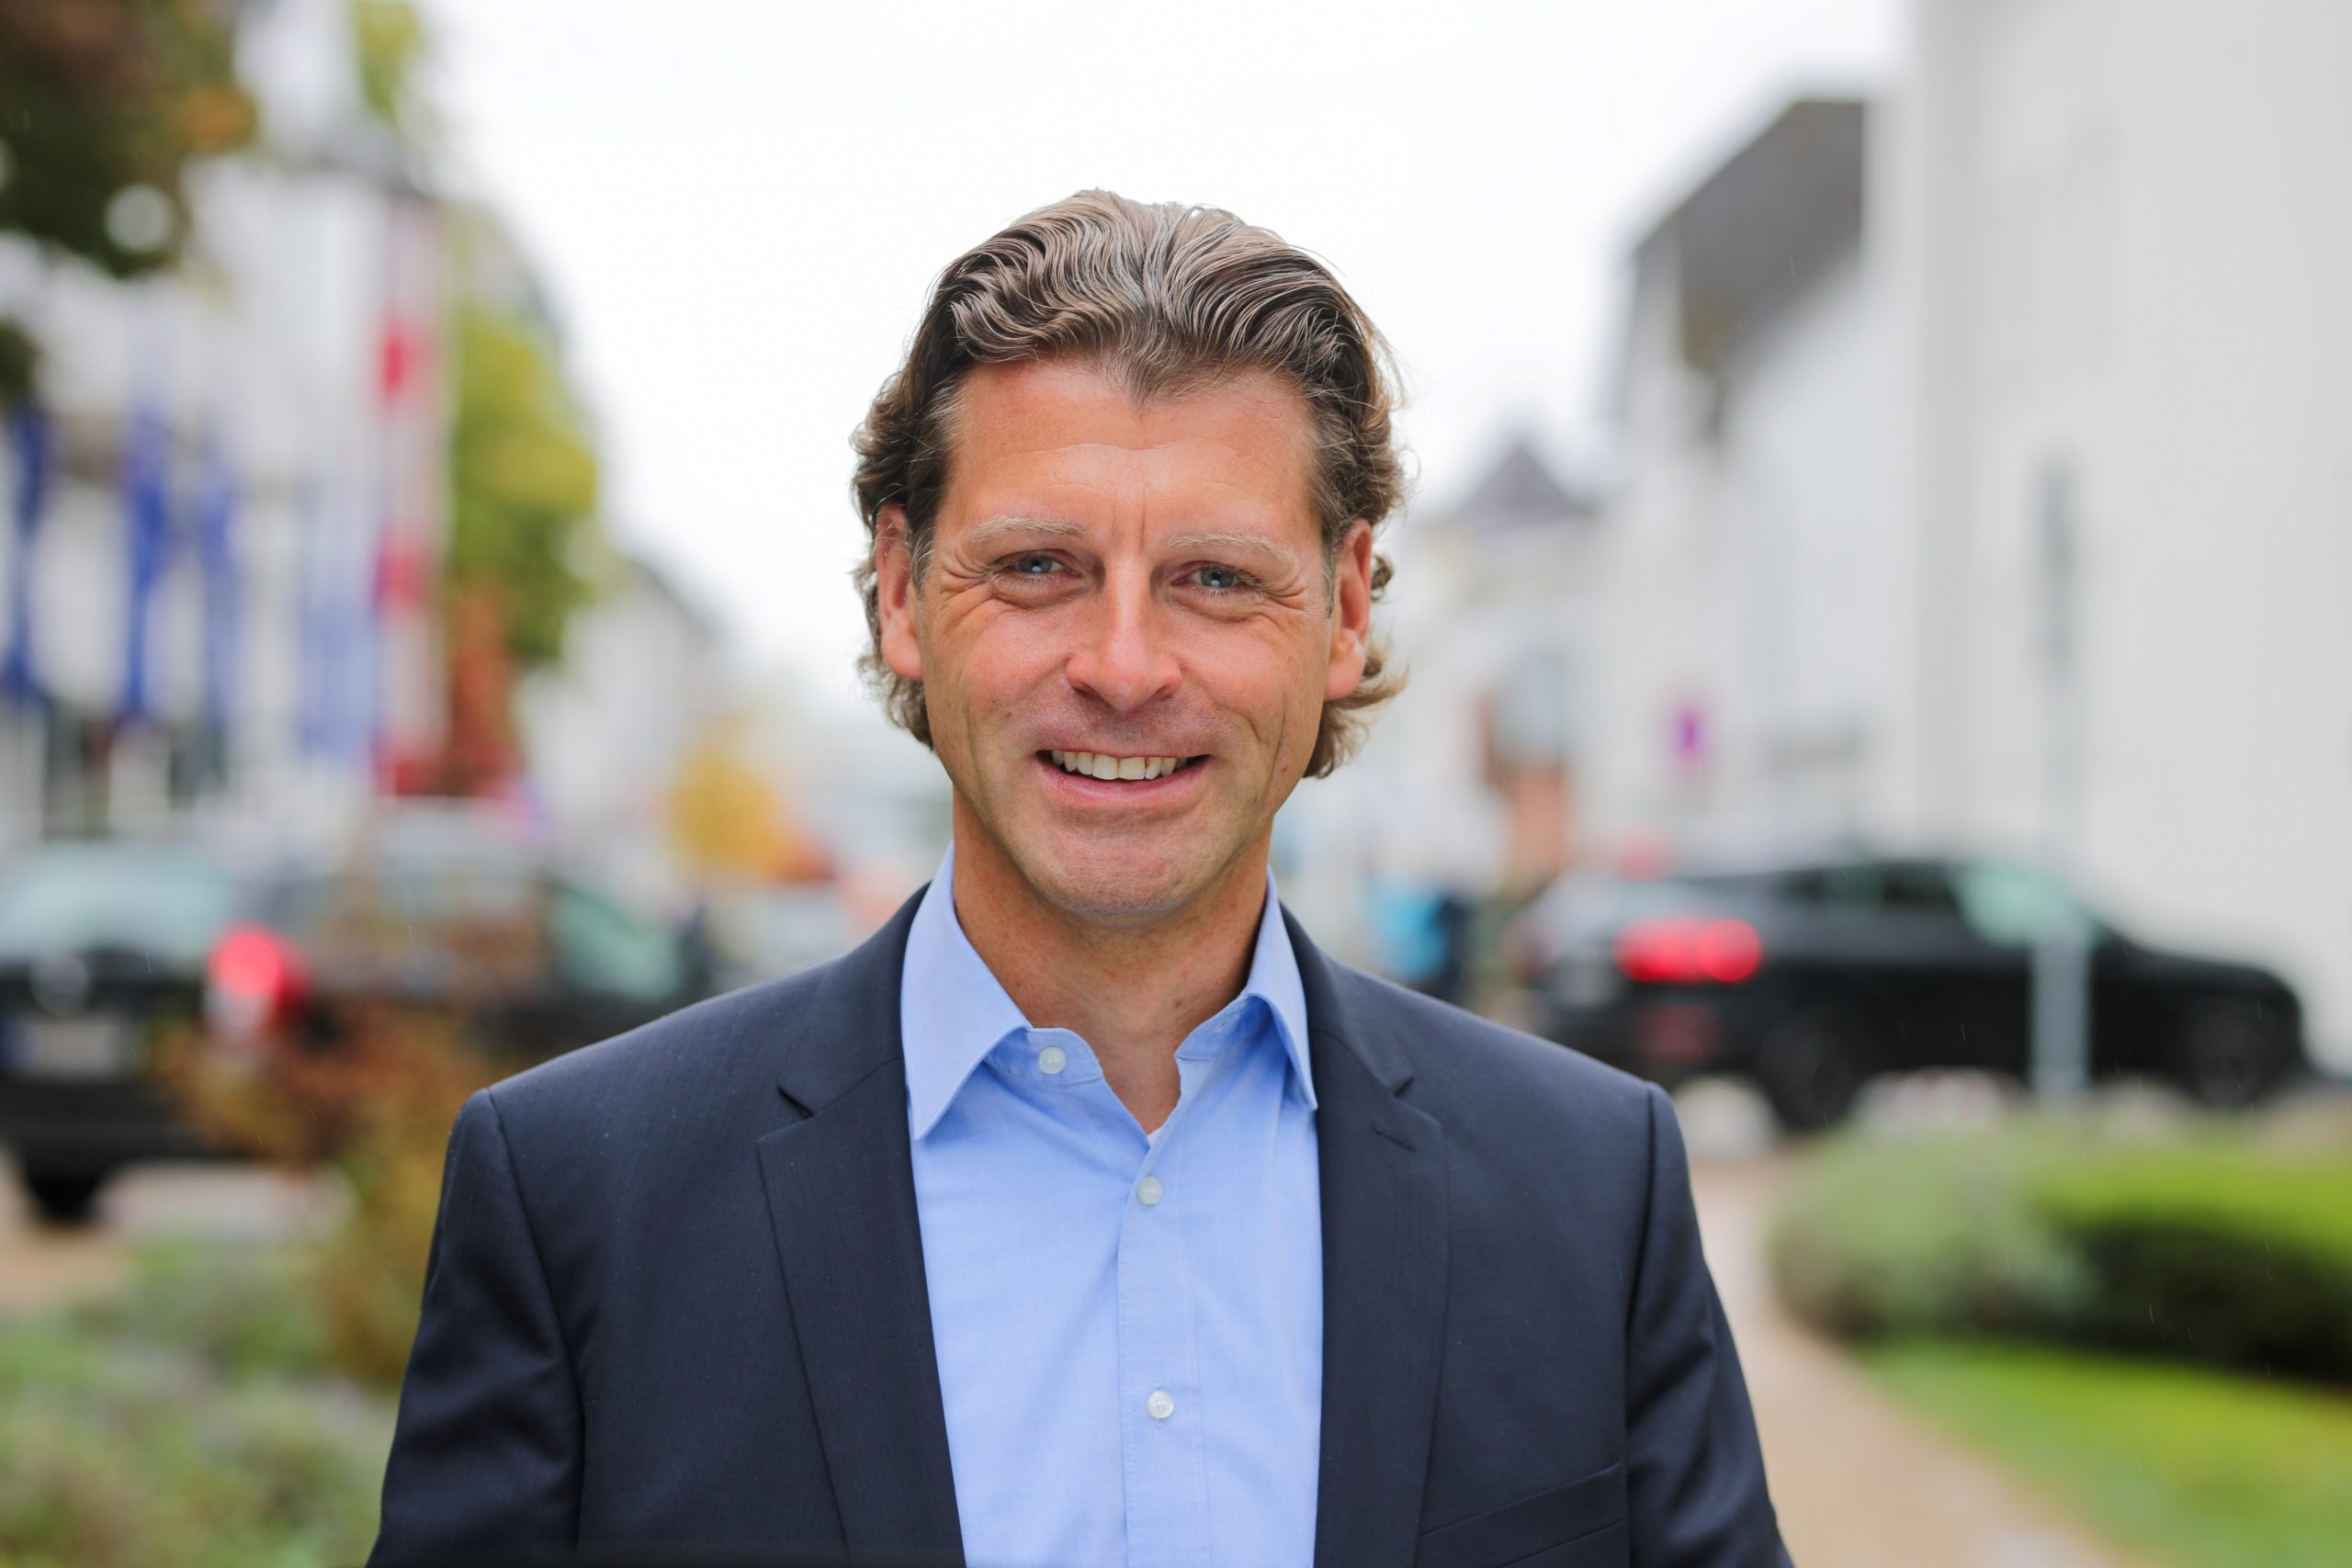 Bürgermeister Timmendorfer Strand